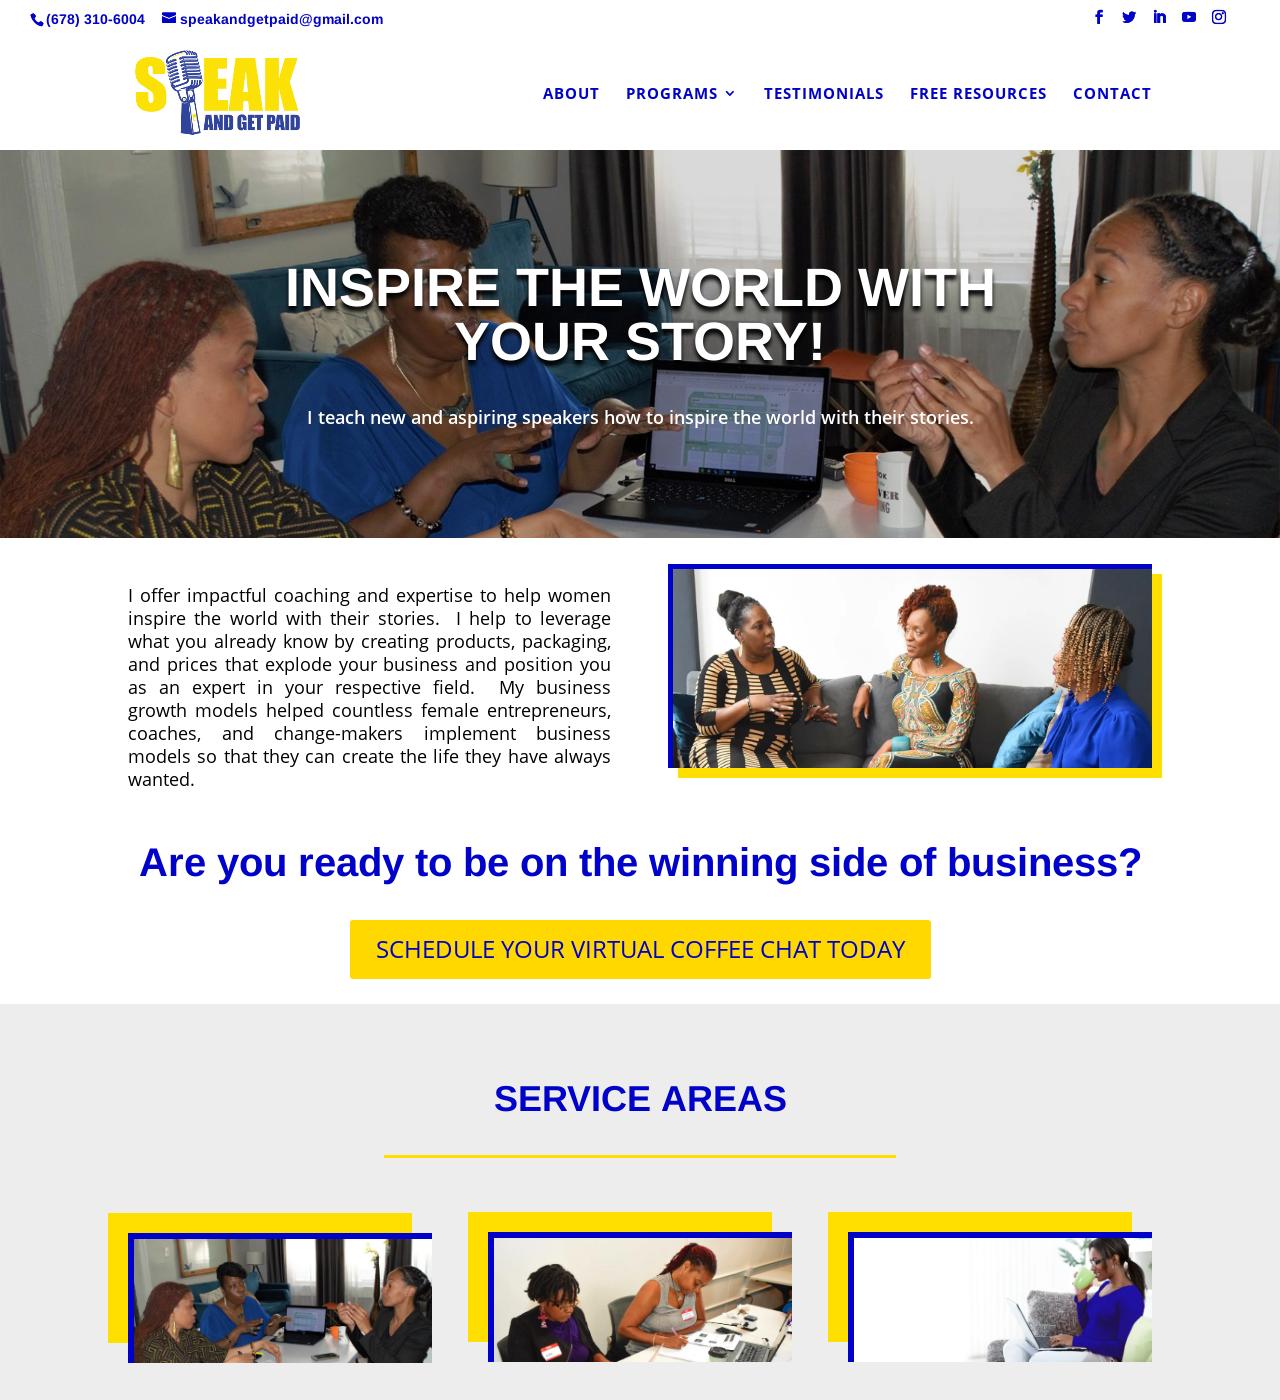 Birmingham Website Design Agency - C Kinion Design - Speak and Get Paid